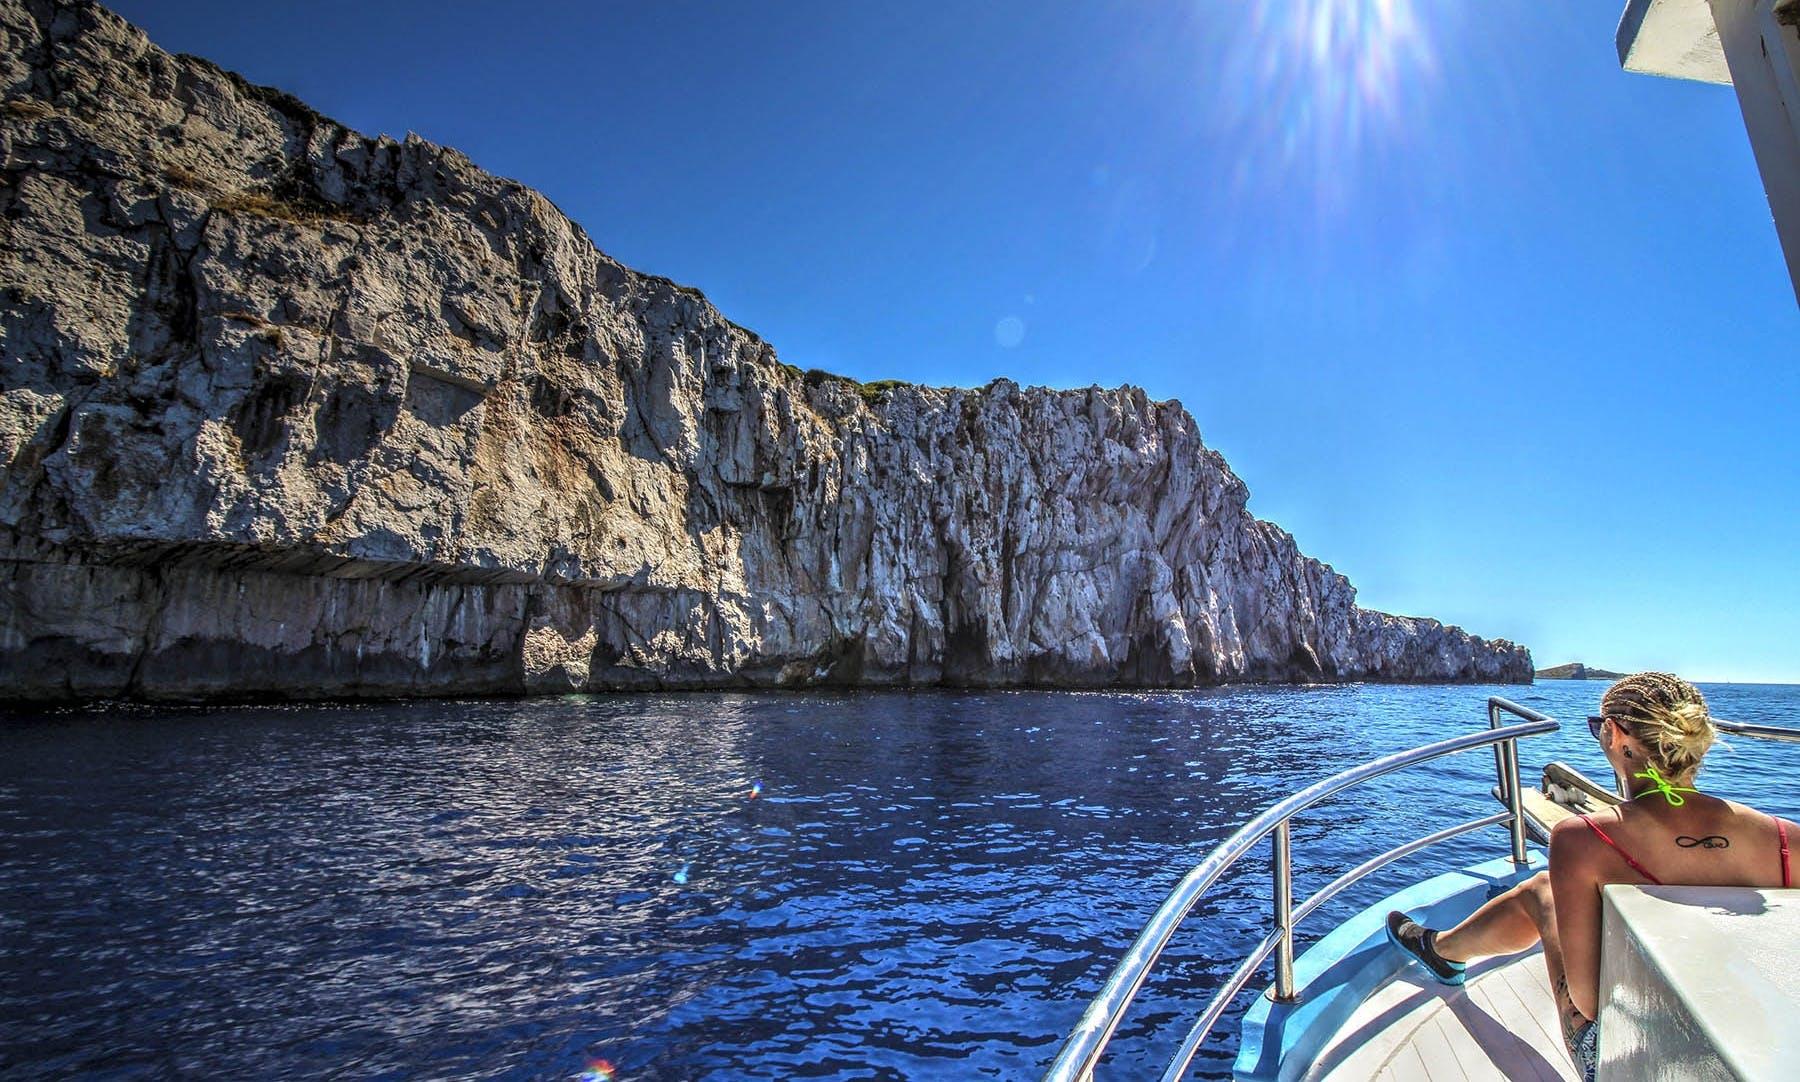 Passenger Boat Mikado rental in Zadar, Croatia